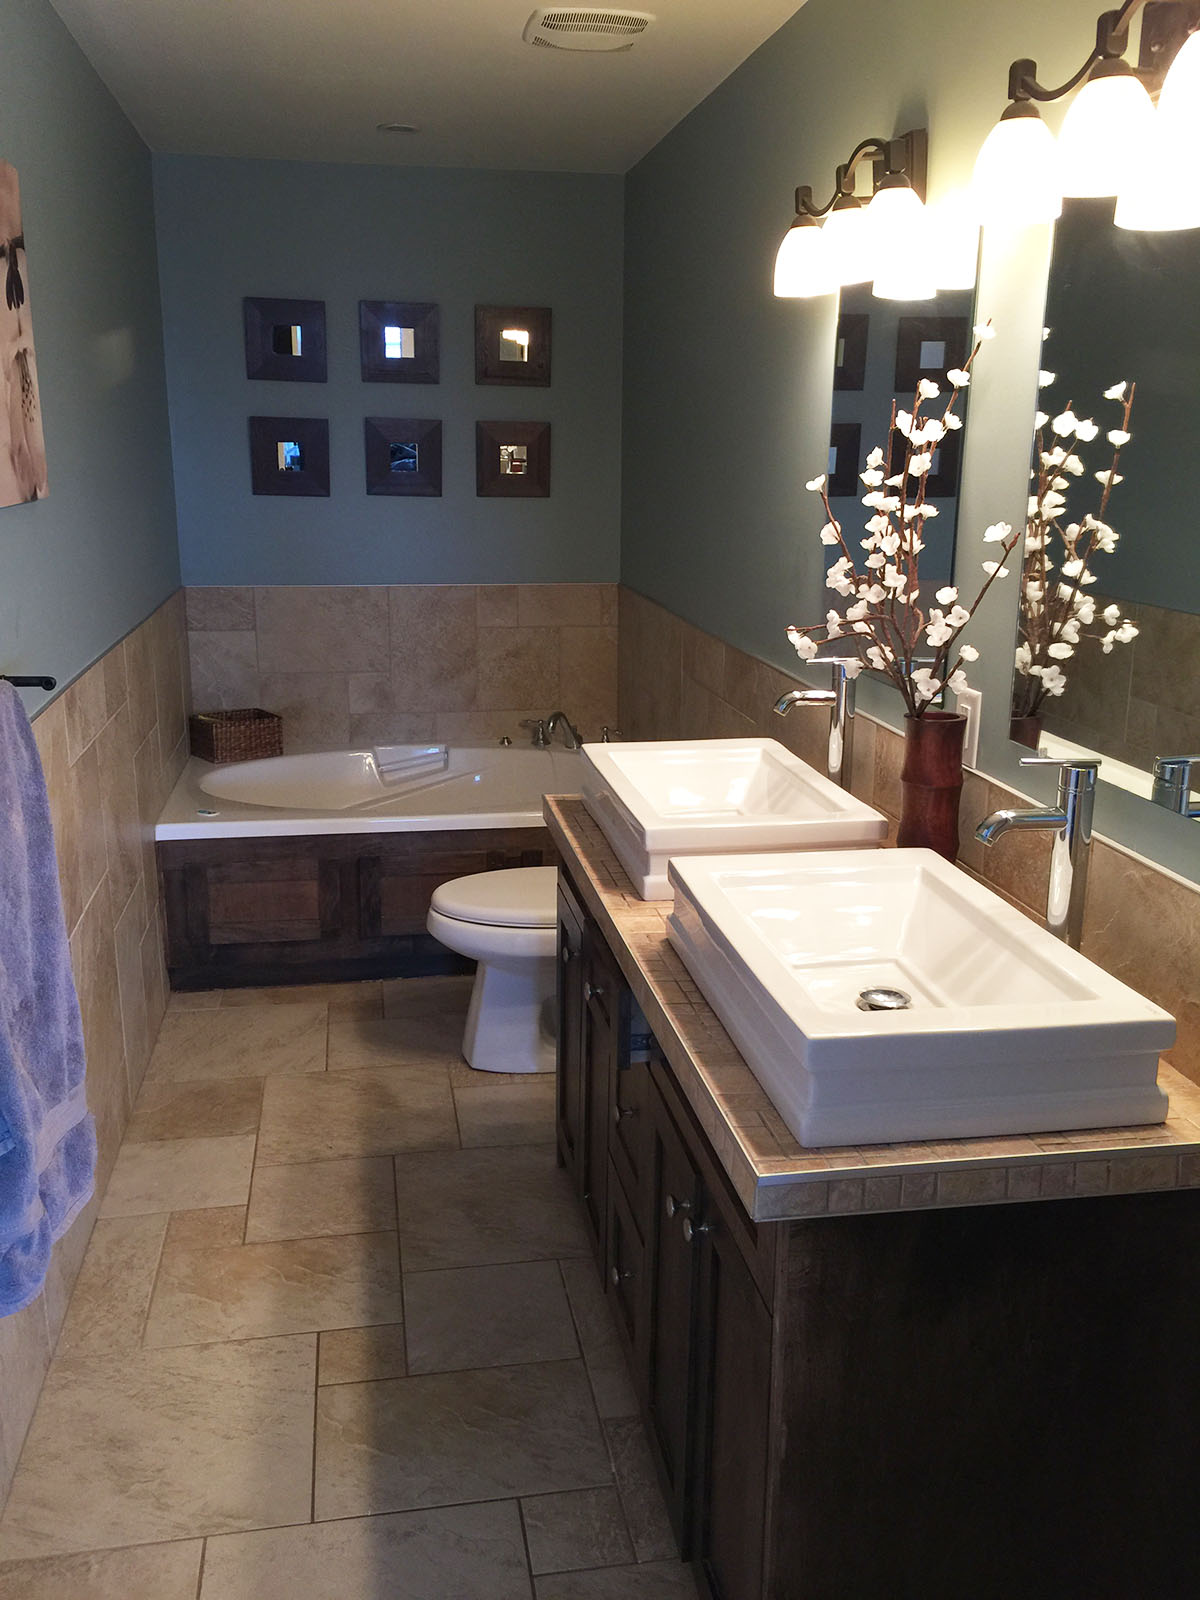 Bathroom Renovations Calgary home renovations in calgary | details home designs | renovation